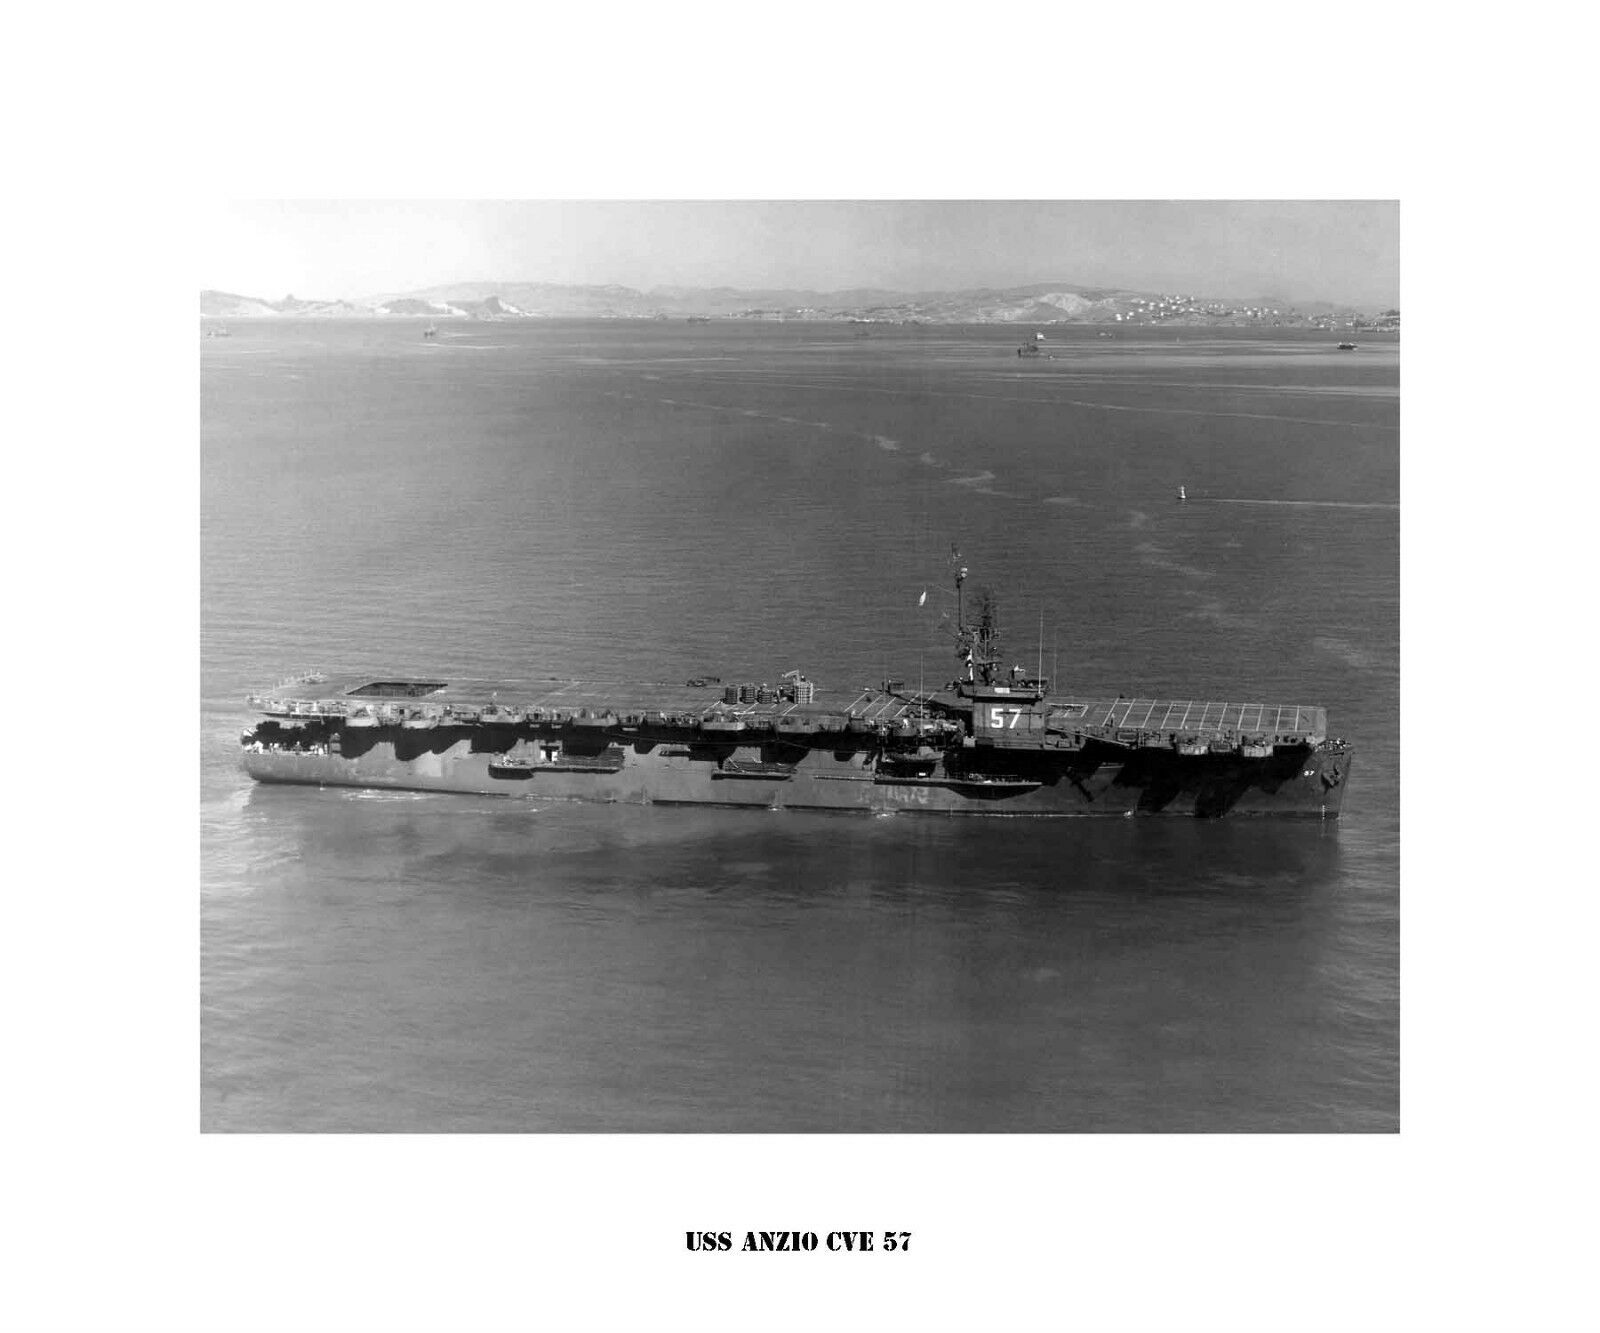 USS ANZIO CVE 57  Naval Ship Photo Print, USN Navy